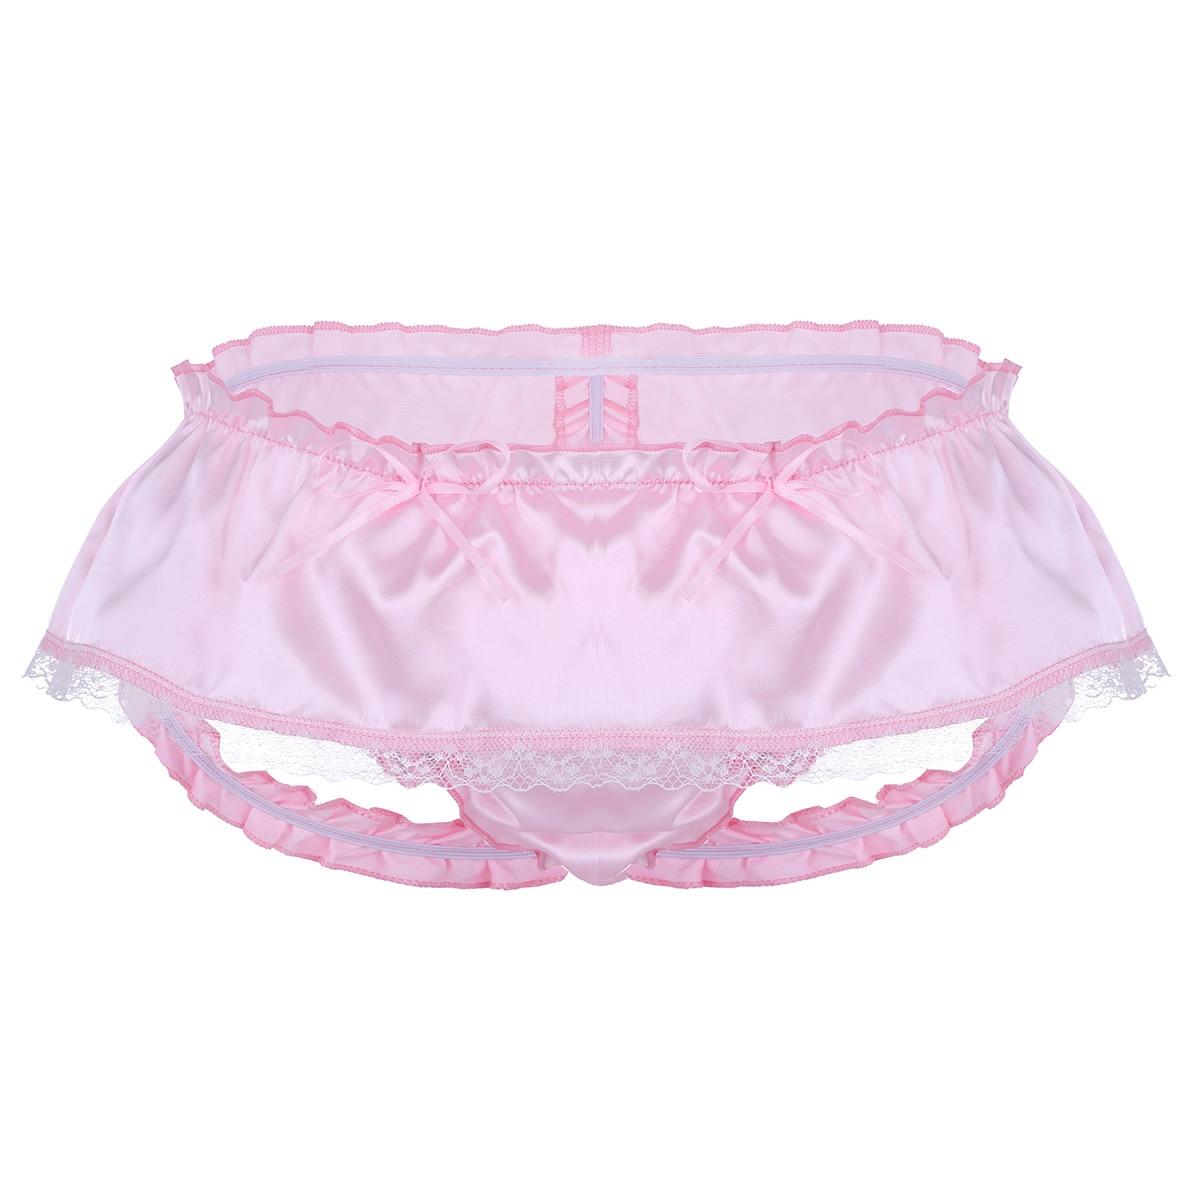 Men Lingerie Shiny Satin Panties Ruffled 3 Bum Straps Skirted Jockstraps Pouch Panties Sissy Open Butt Lace Briefs Underwear